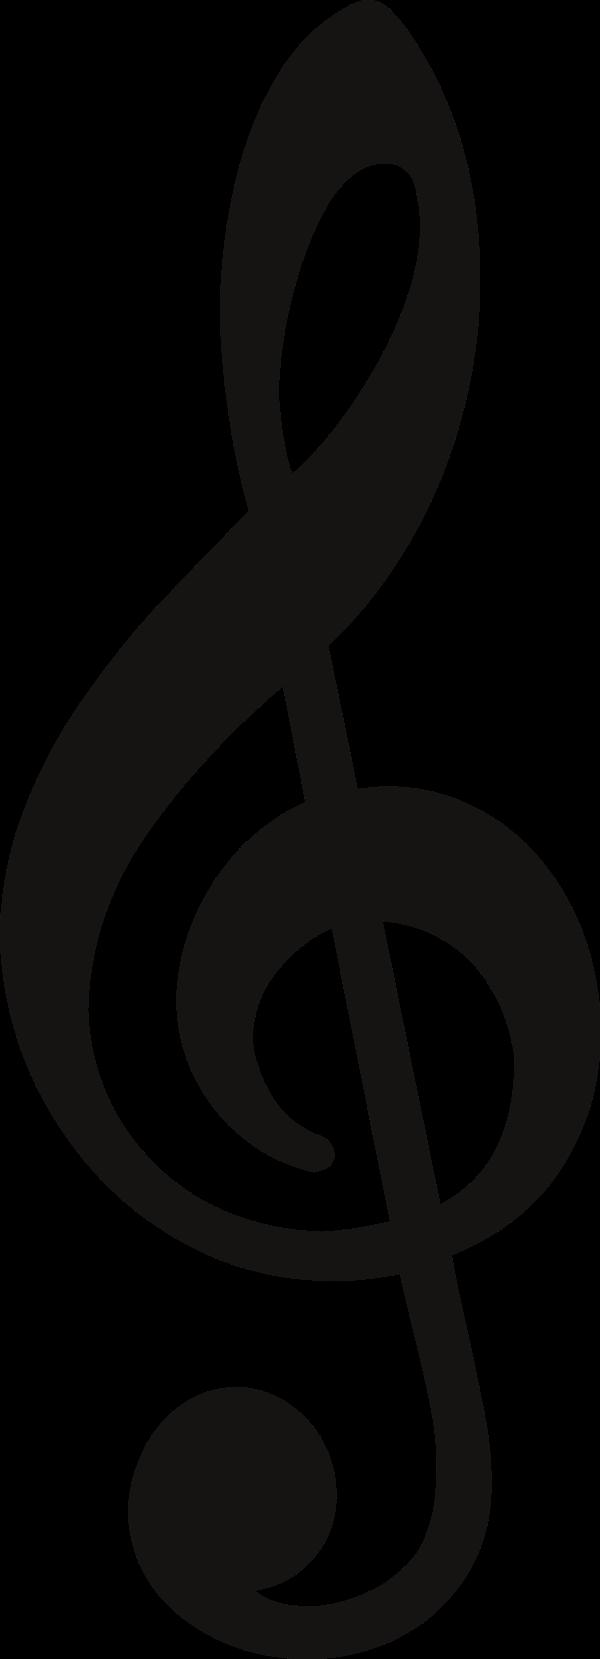 Free Music Symbols Png, Download Free Clip Art, Free Clip.